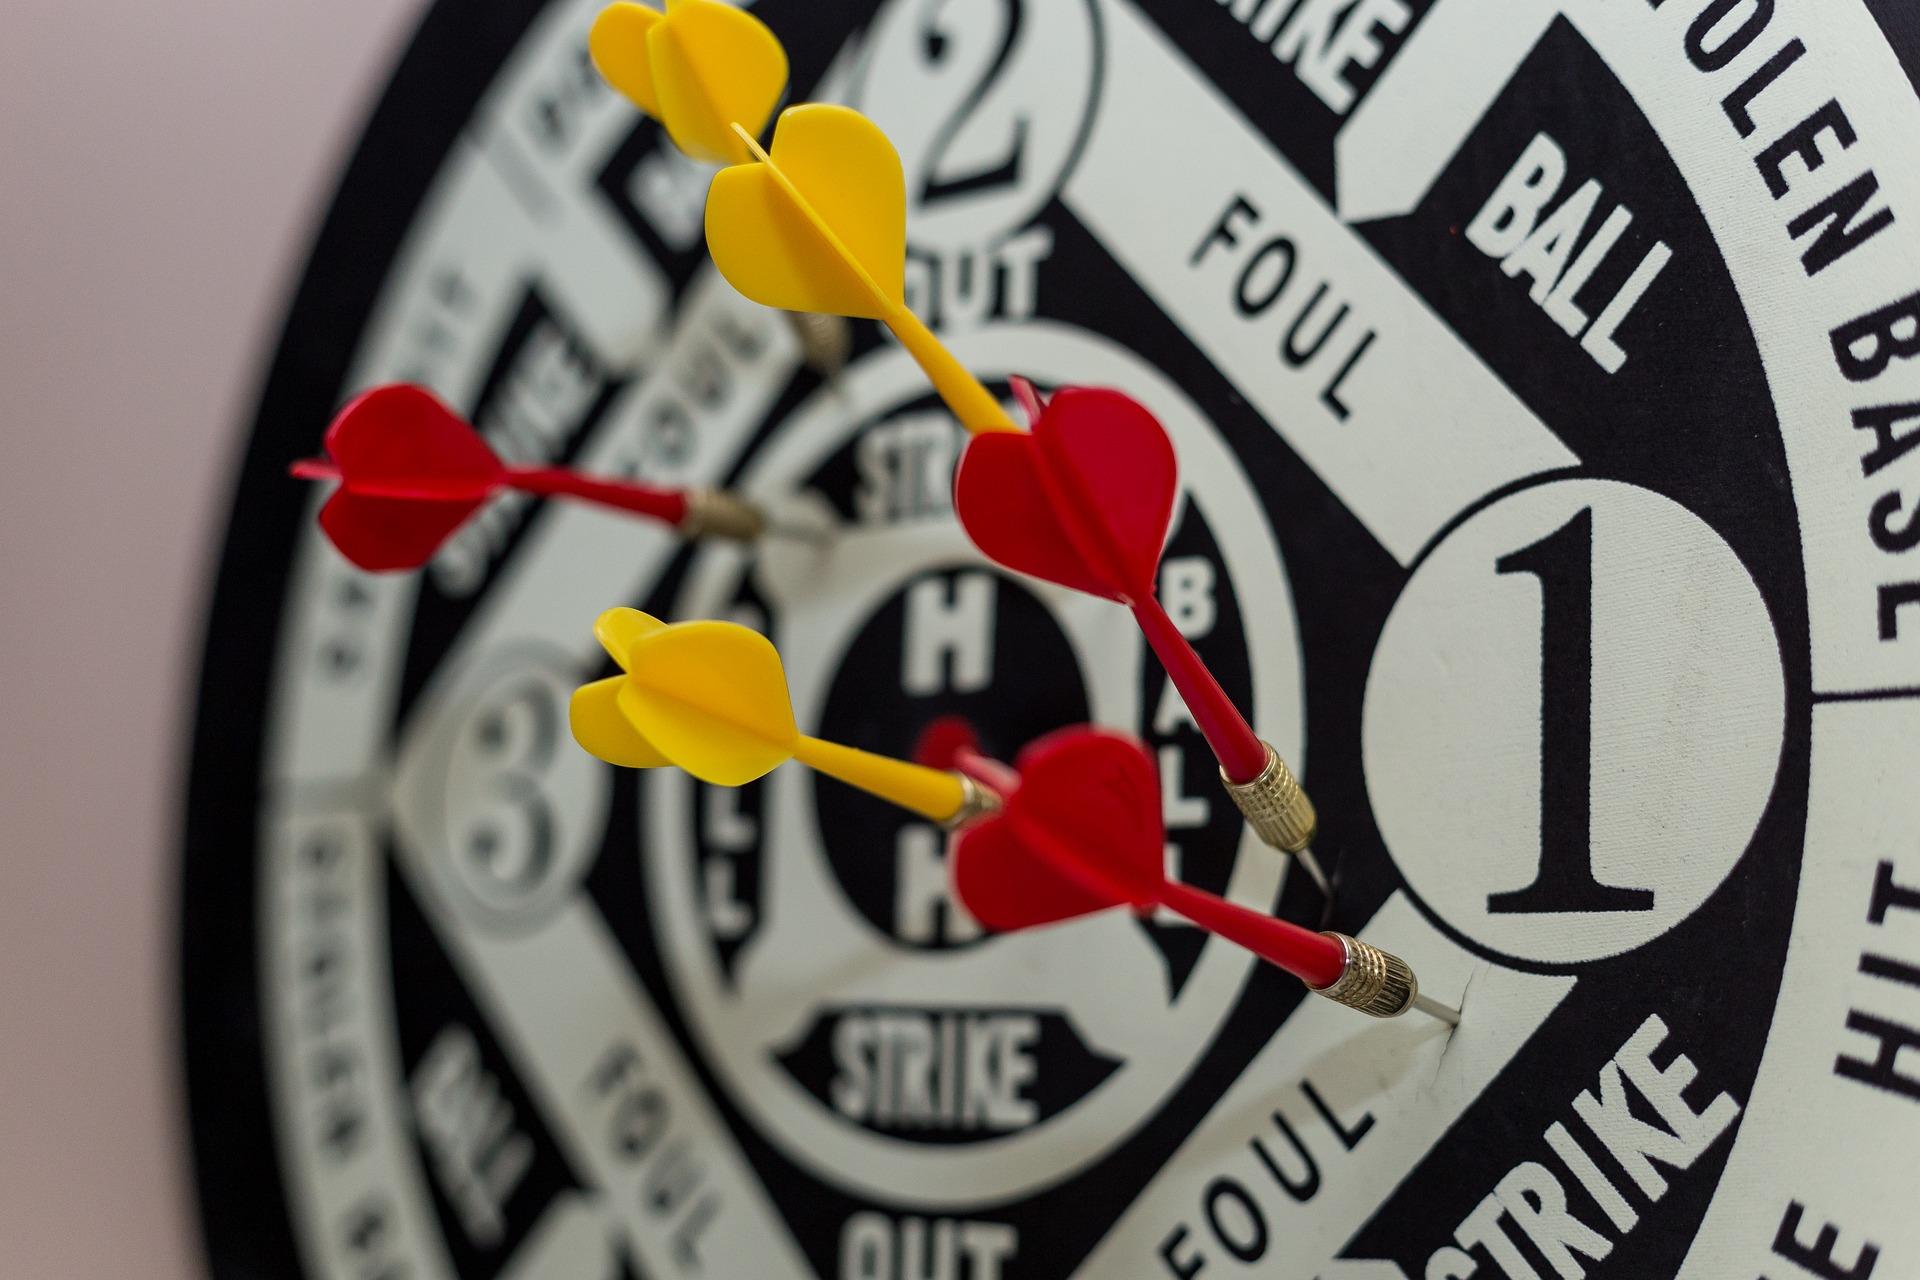 darts-g516ebb98f_1920.jpg